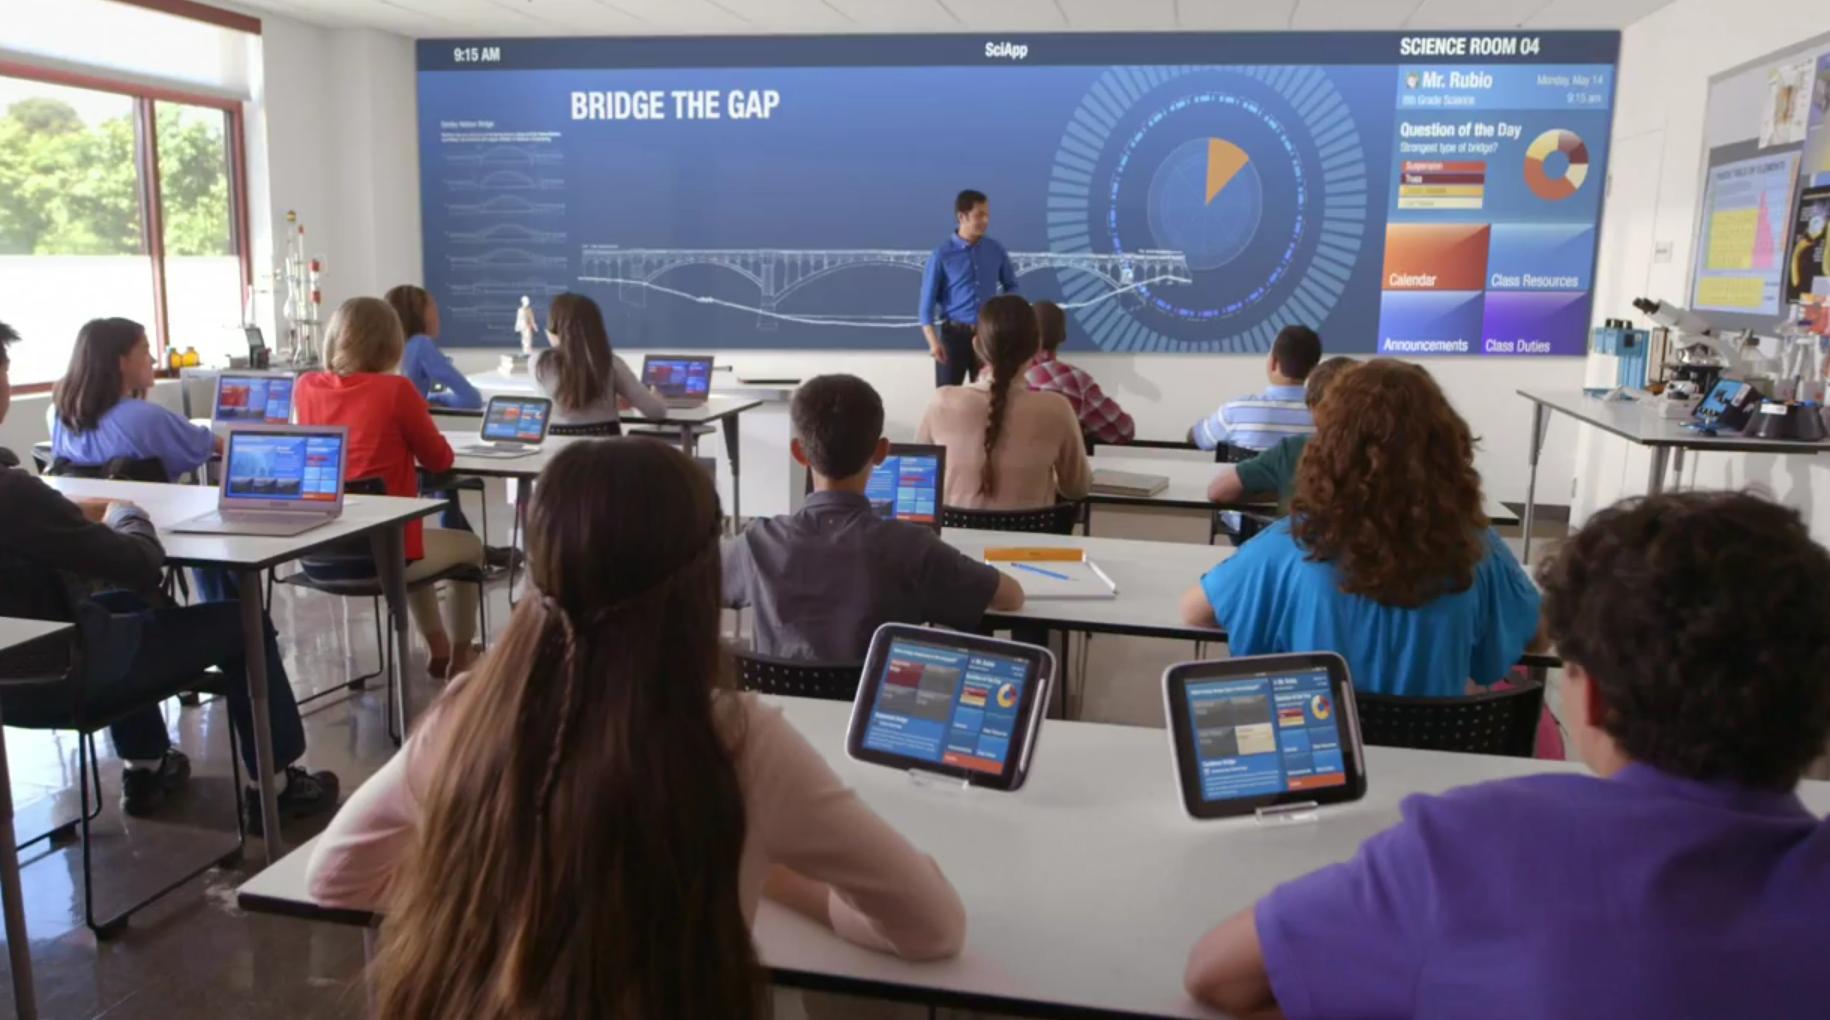 Green Mobile Classrooms Help Teach Environmental Issues